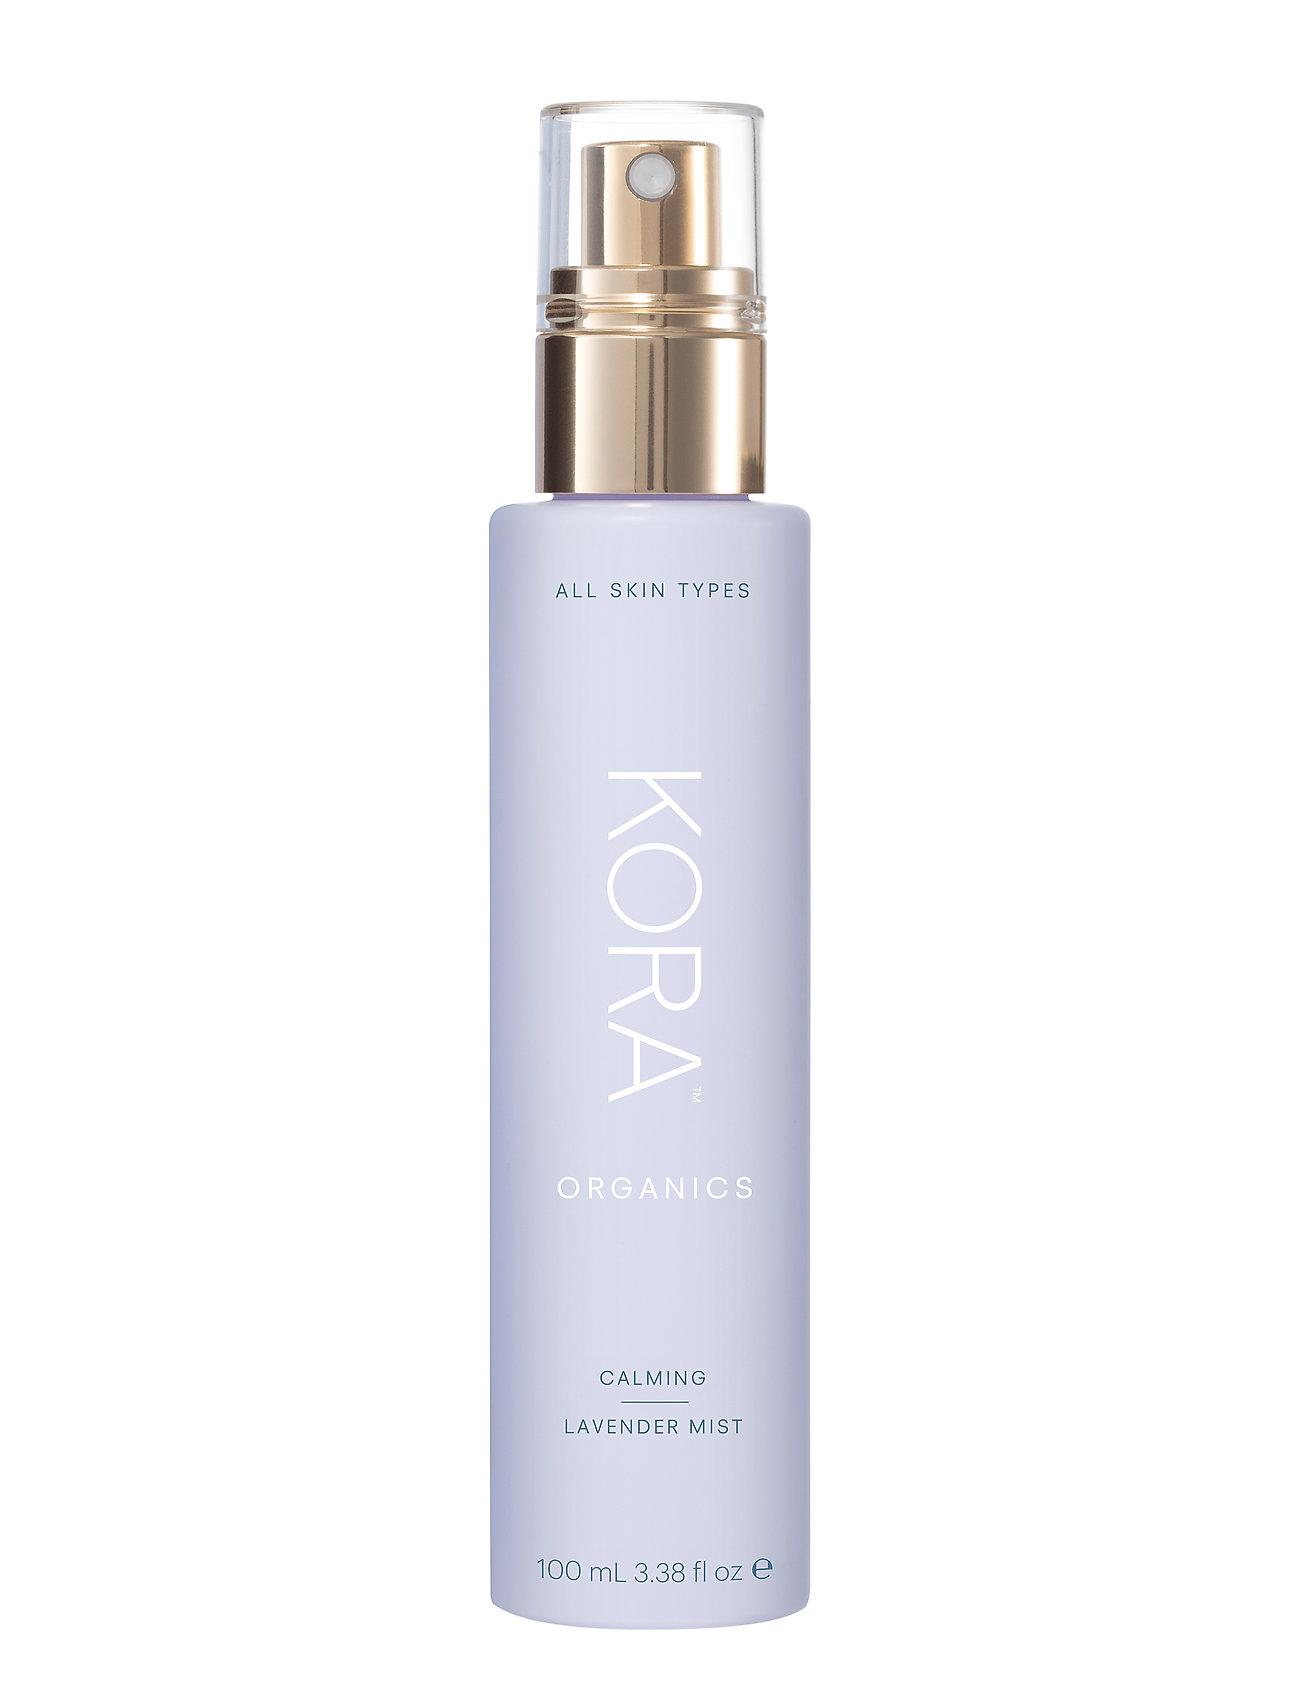 Image of Calming Lavender Mist Beauty WOMEN Skin Care Face Face Mist Nude Kora Organics (3199488947)